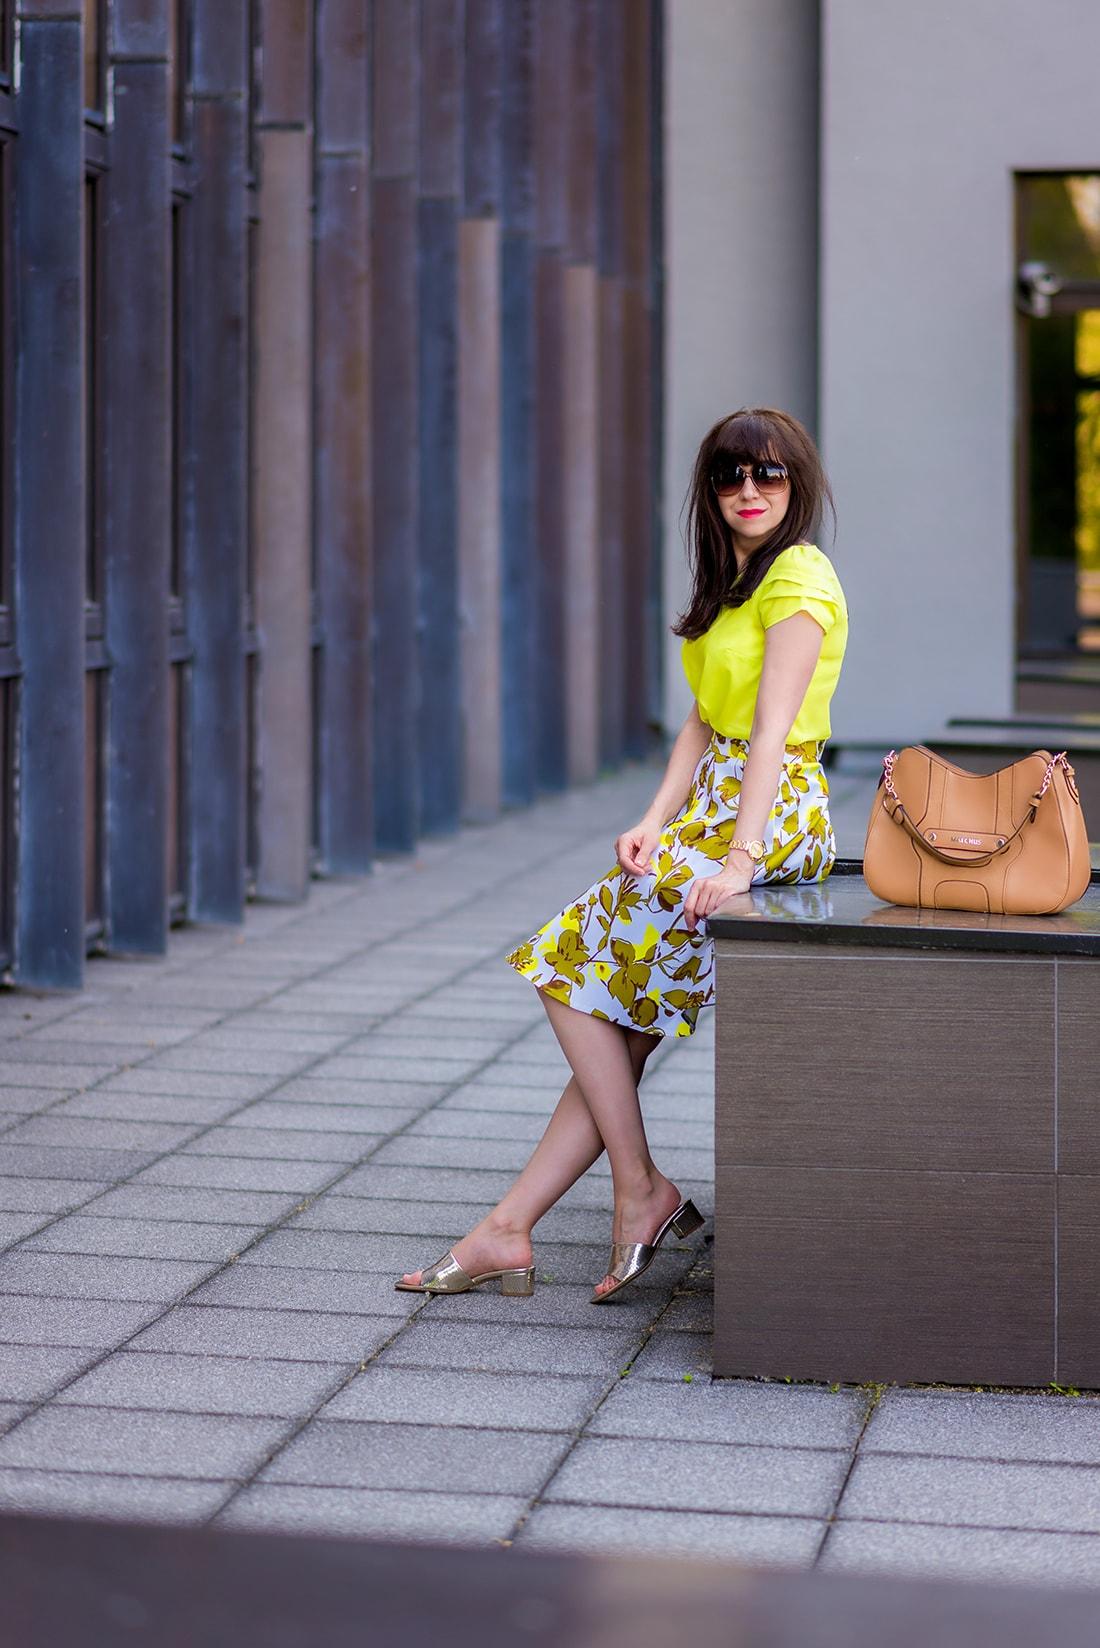 SUKŃA NA LETO OD MARGIFASHION_Katharine-fashion is beautiful_blog 7_Sukňa zelené kvety_Zlaté šľapky Sagan_Katarína Jakubčová_Fashion blogger